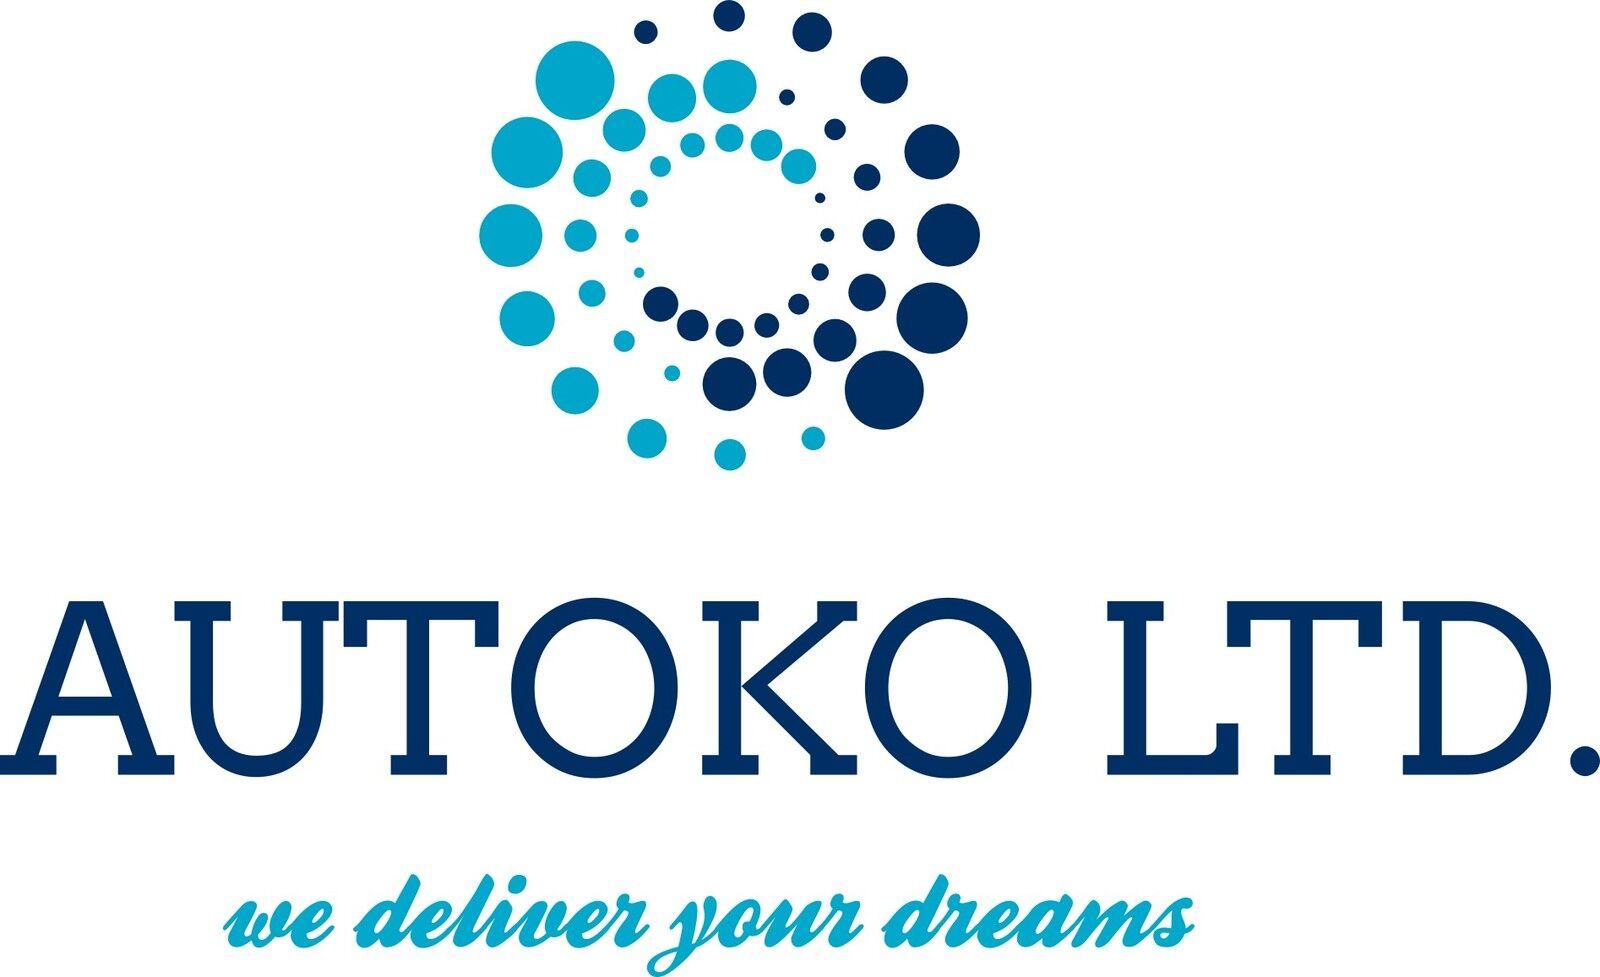 Autoko Ltd